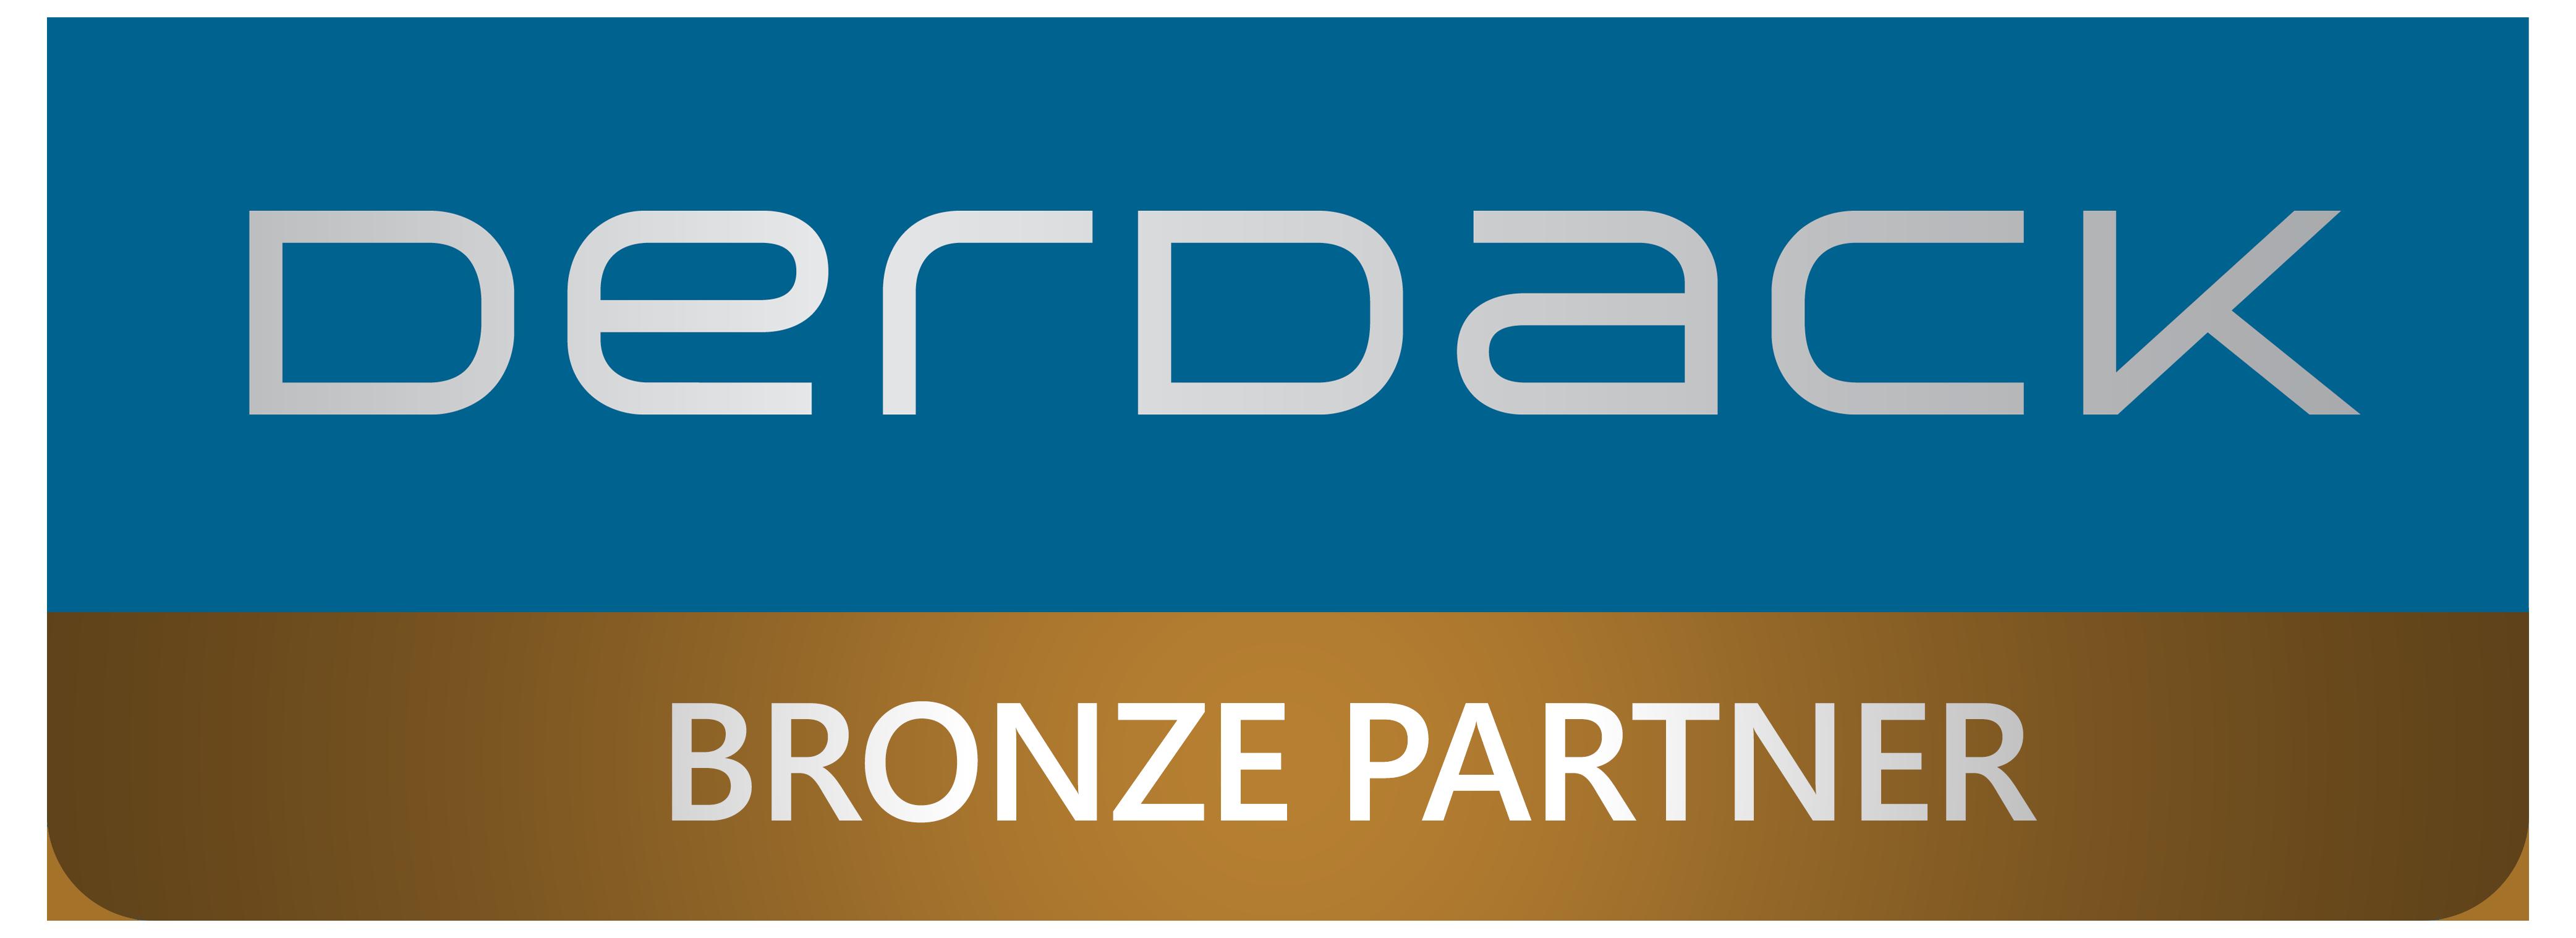 Partnerlogos_2021_bronze_glossy